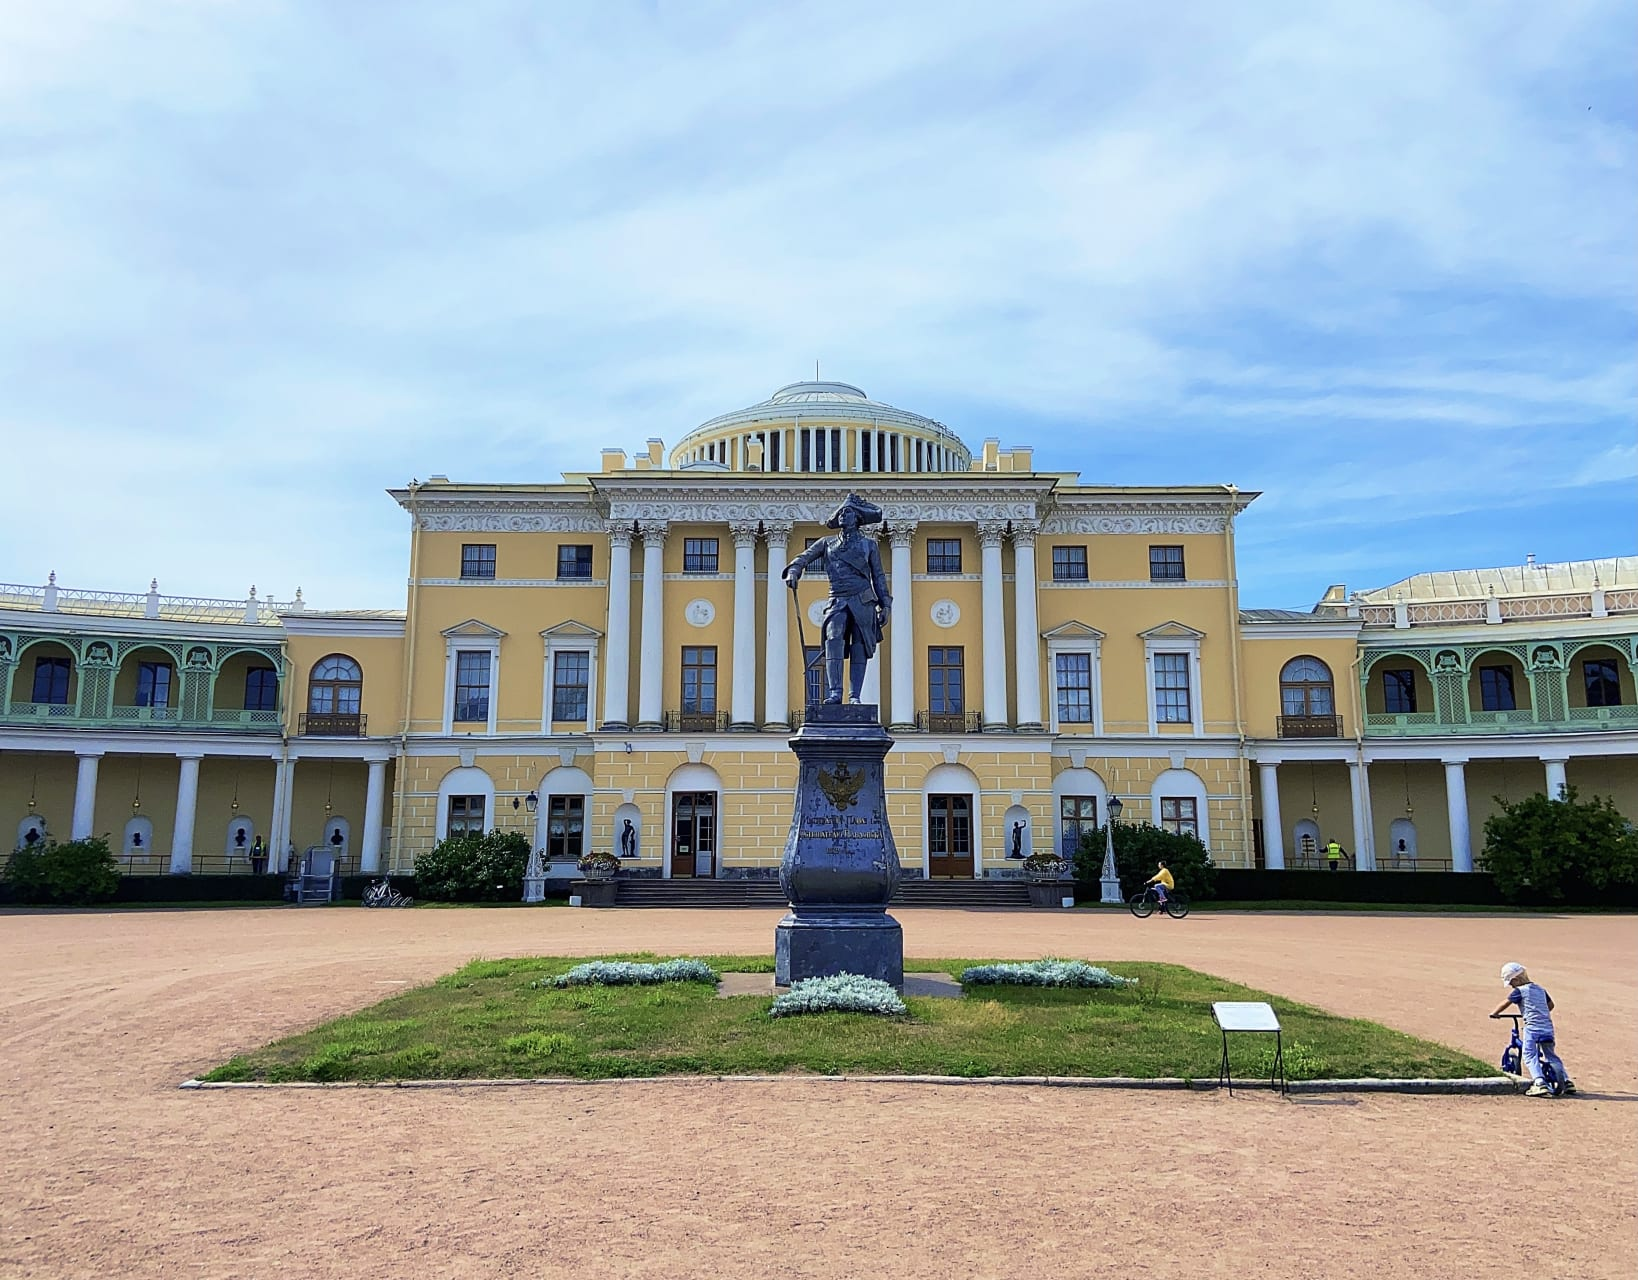 Saint Petersburg - Pavlovsk Residence and Park. Part I